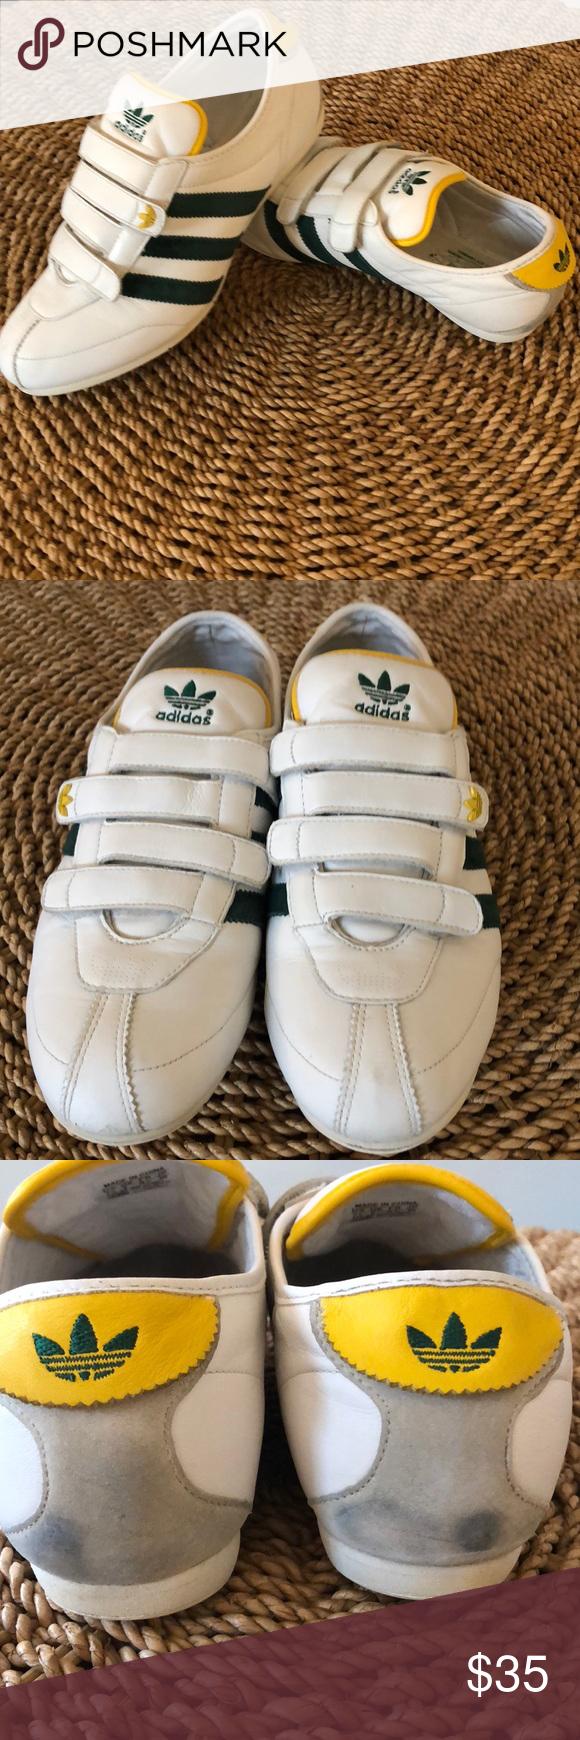 Mujer joven Sermón Residente  Adidas • Okapi 2 Leather Running Shoes Velcro   Adidas women, Running  shoes, White sneaker